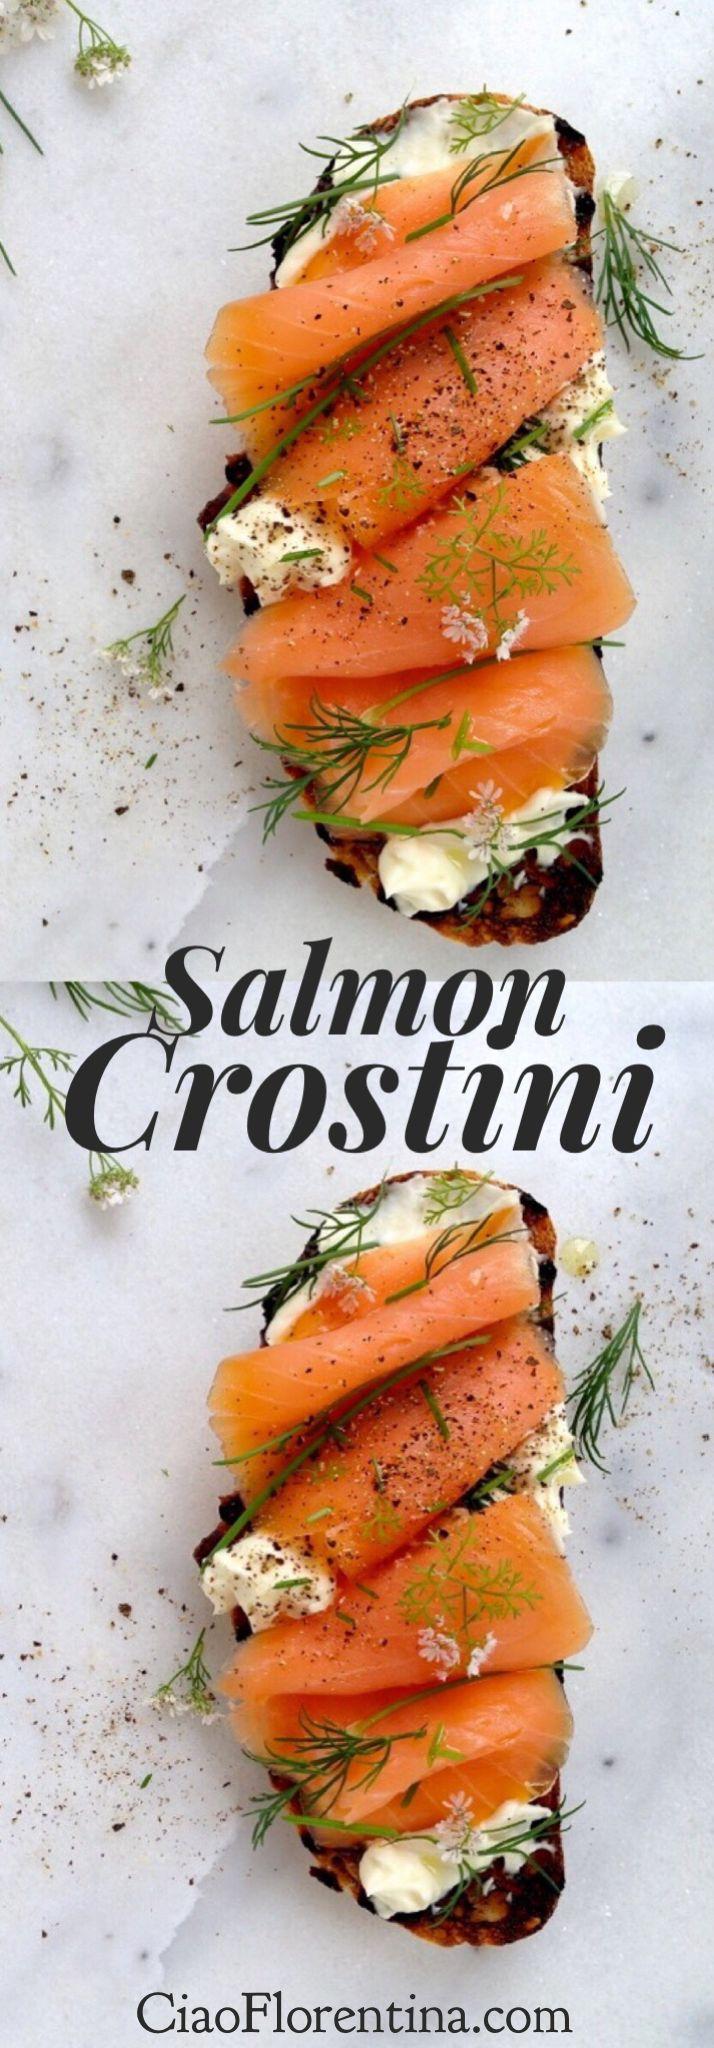 Smoked Salmon Crostini Recipe with Italian Mascarpone Cheese and Herbs | CiaoFlorentina.com @CiaoFlorentina